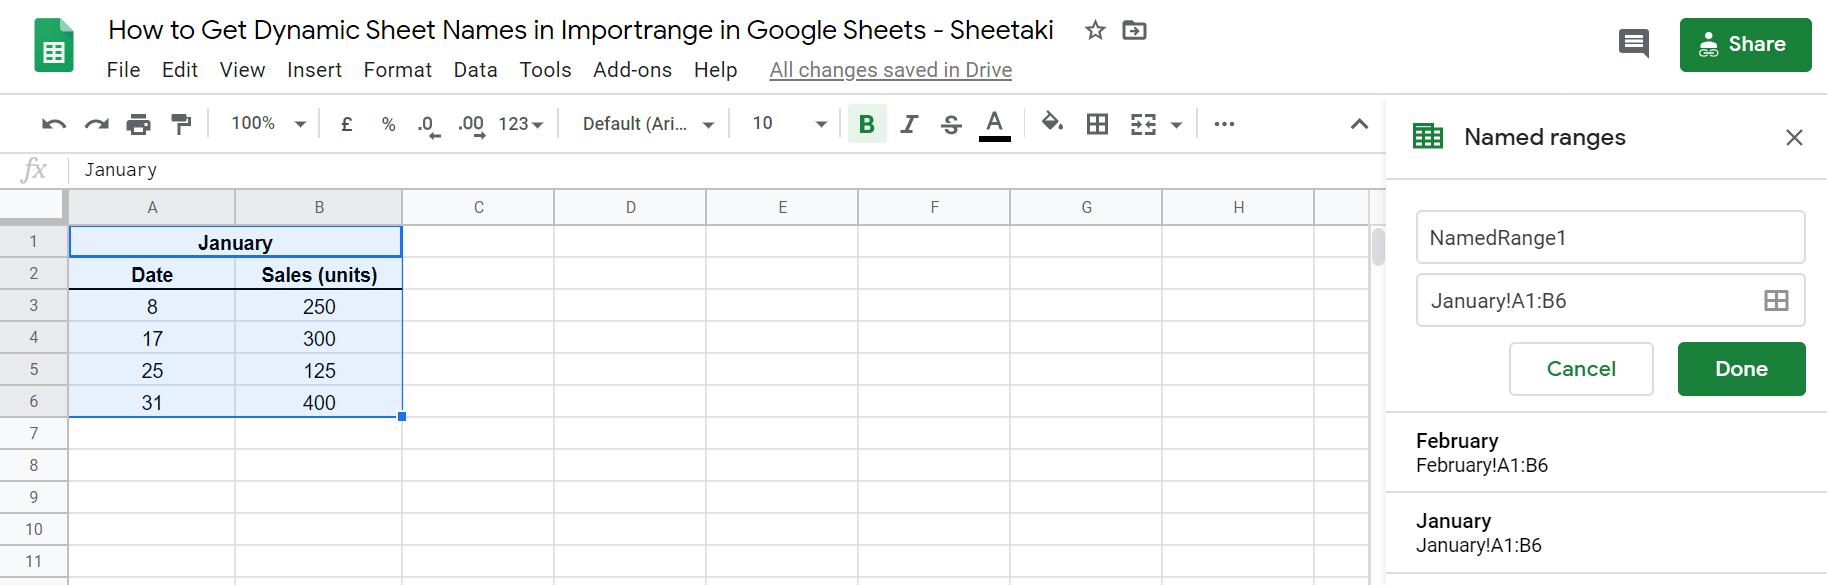 Get Dynamic Sheet Names in Importrange in Google Sheets